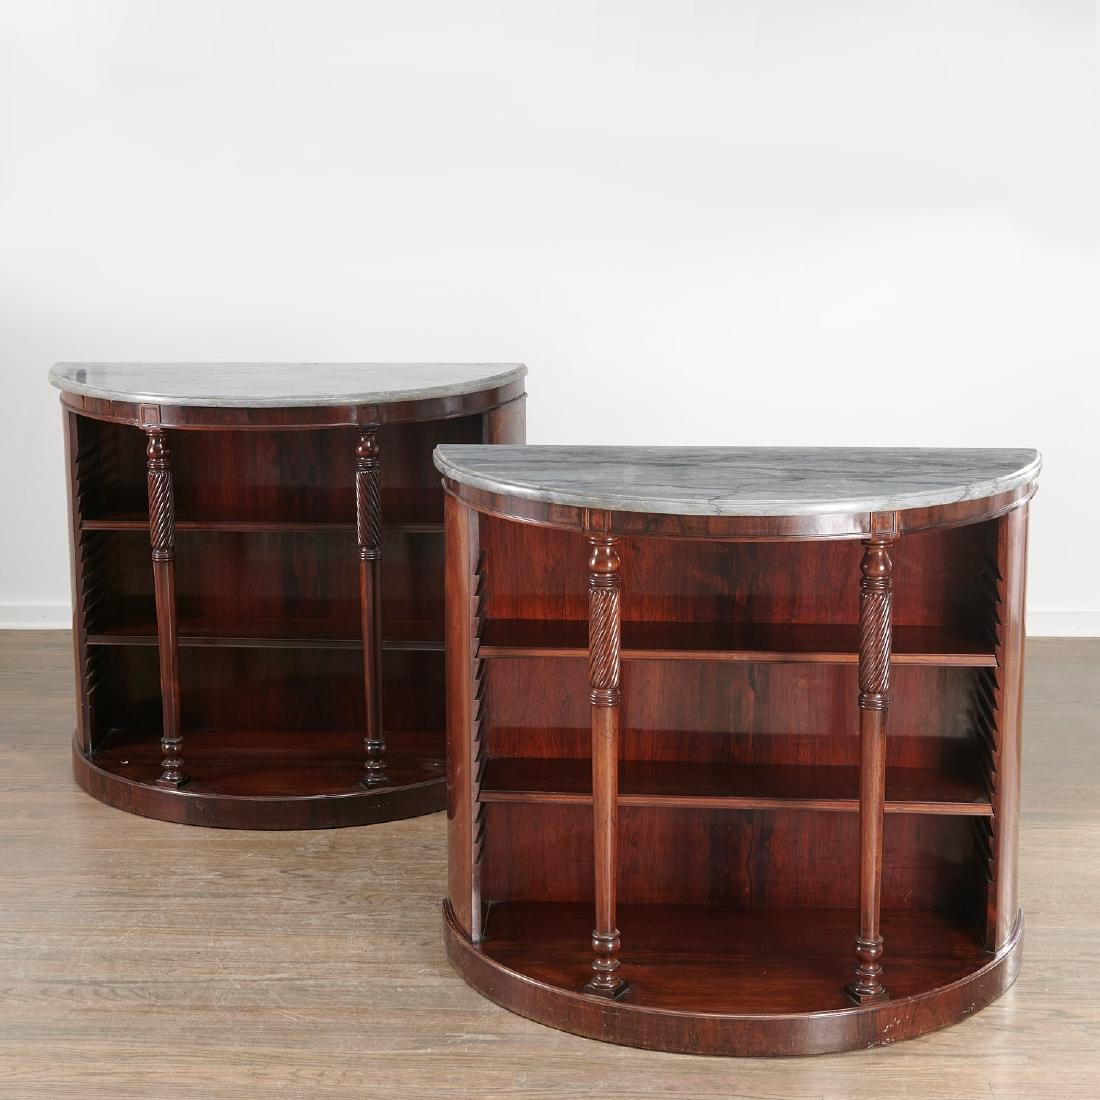 Pair Regency style demilune bookcases